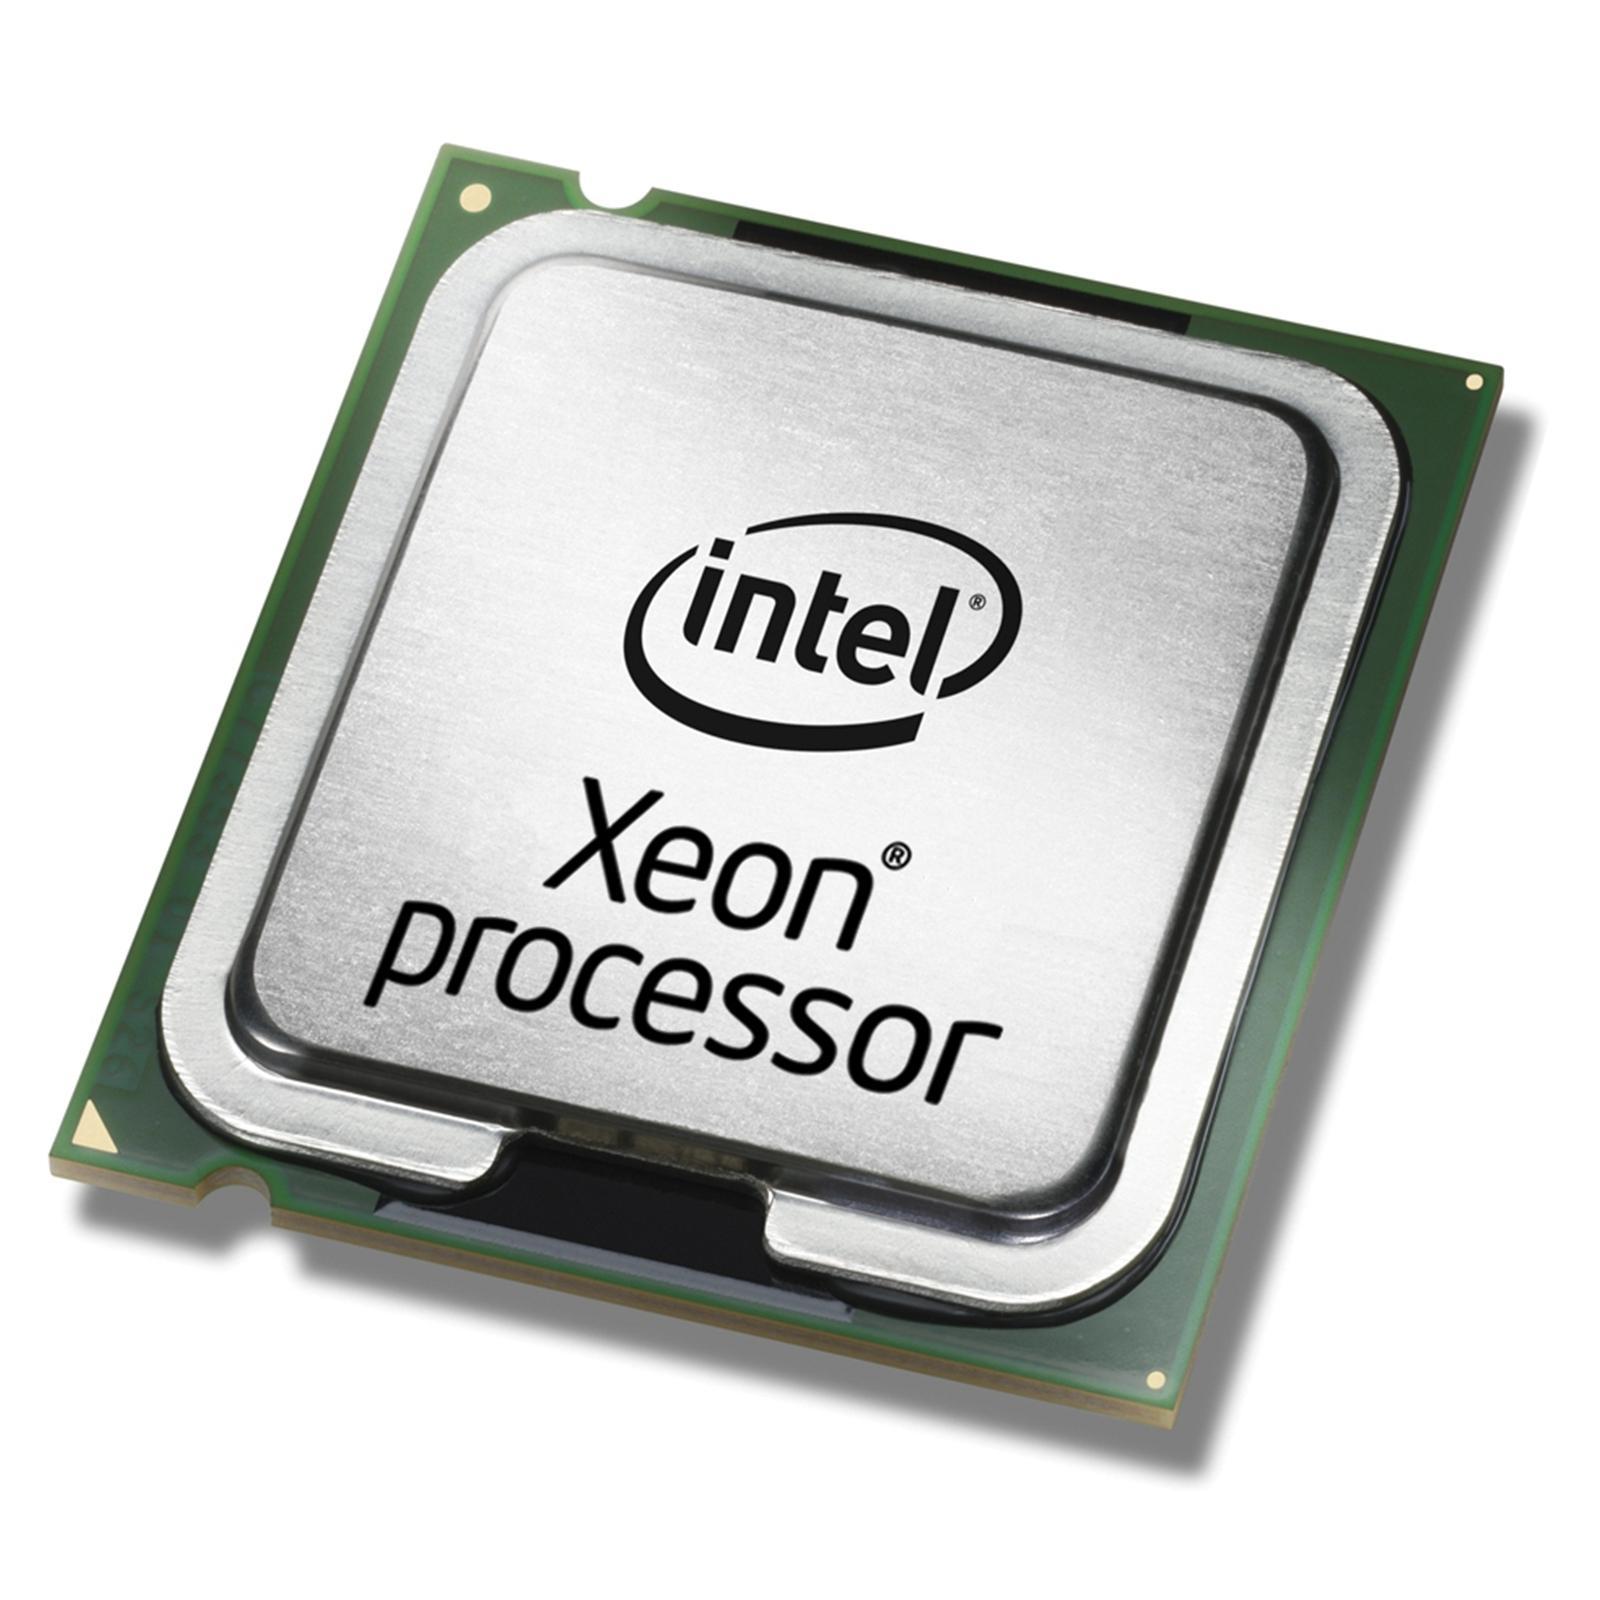 Intel® Xeon® Processor E5-2603 v2 4C 1.8GHz 10MB Cache 1333MHz 80W